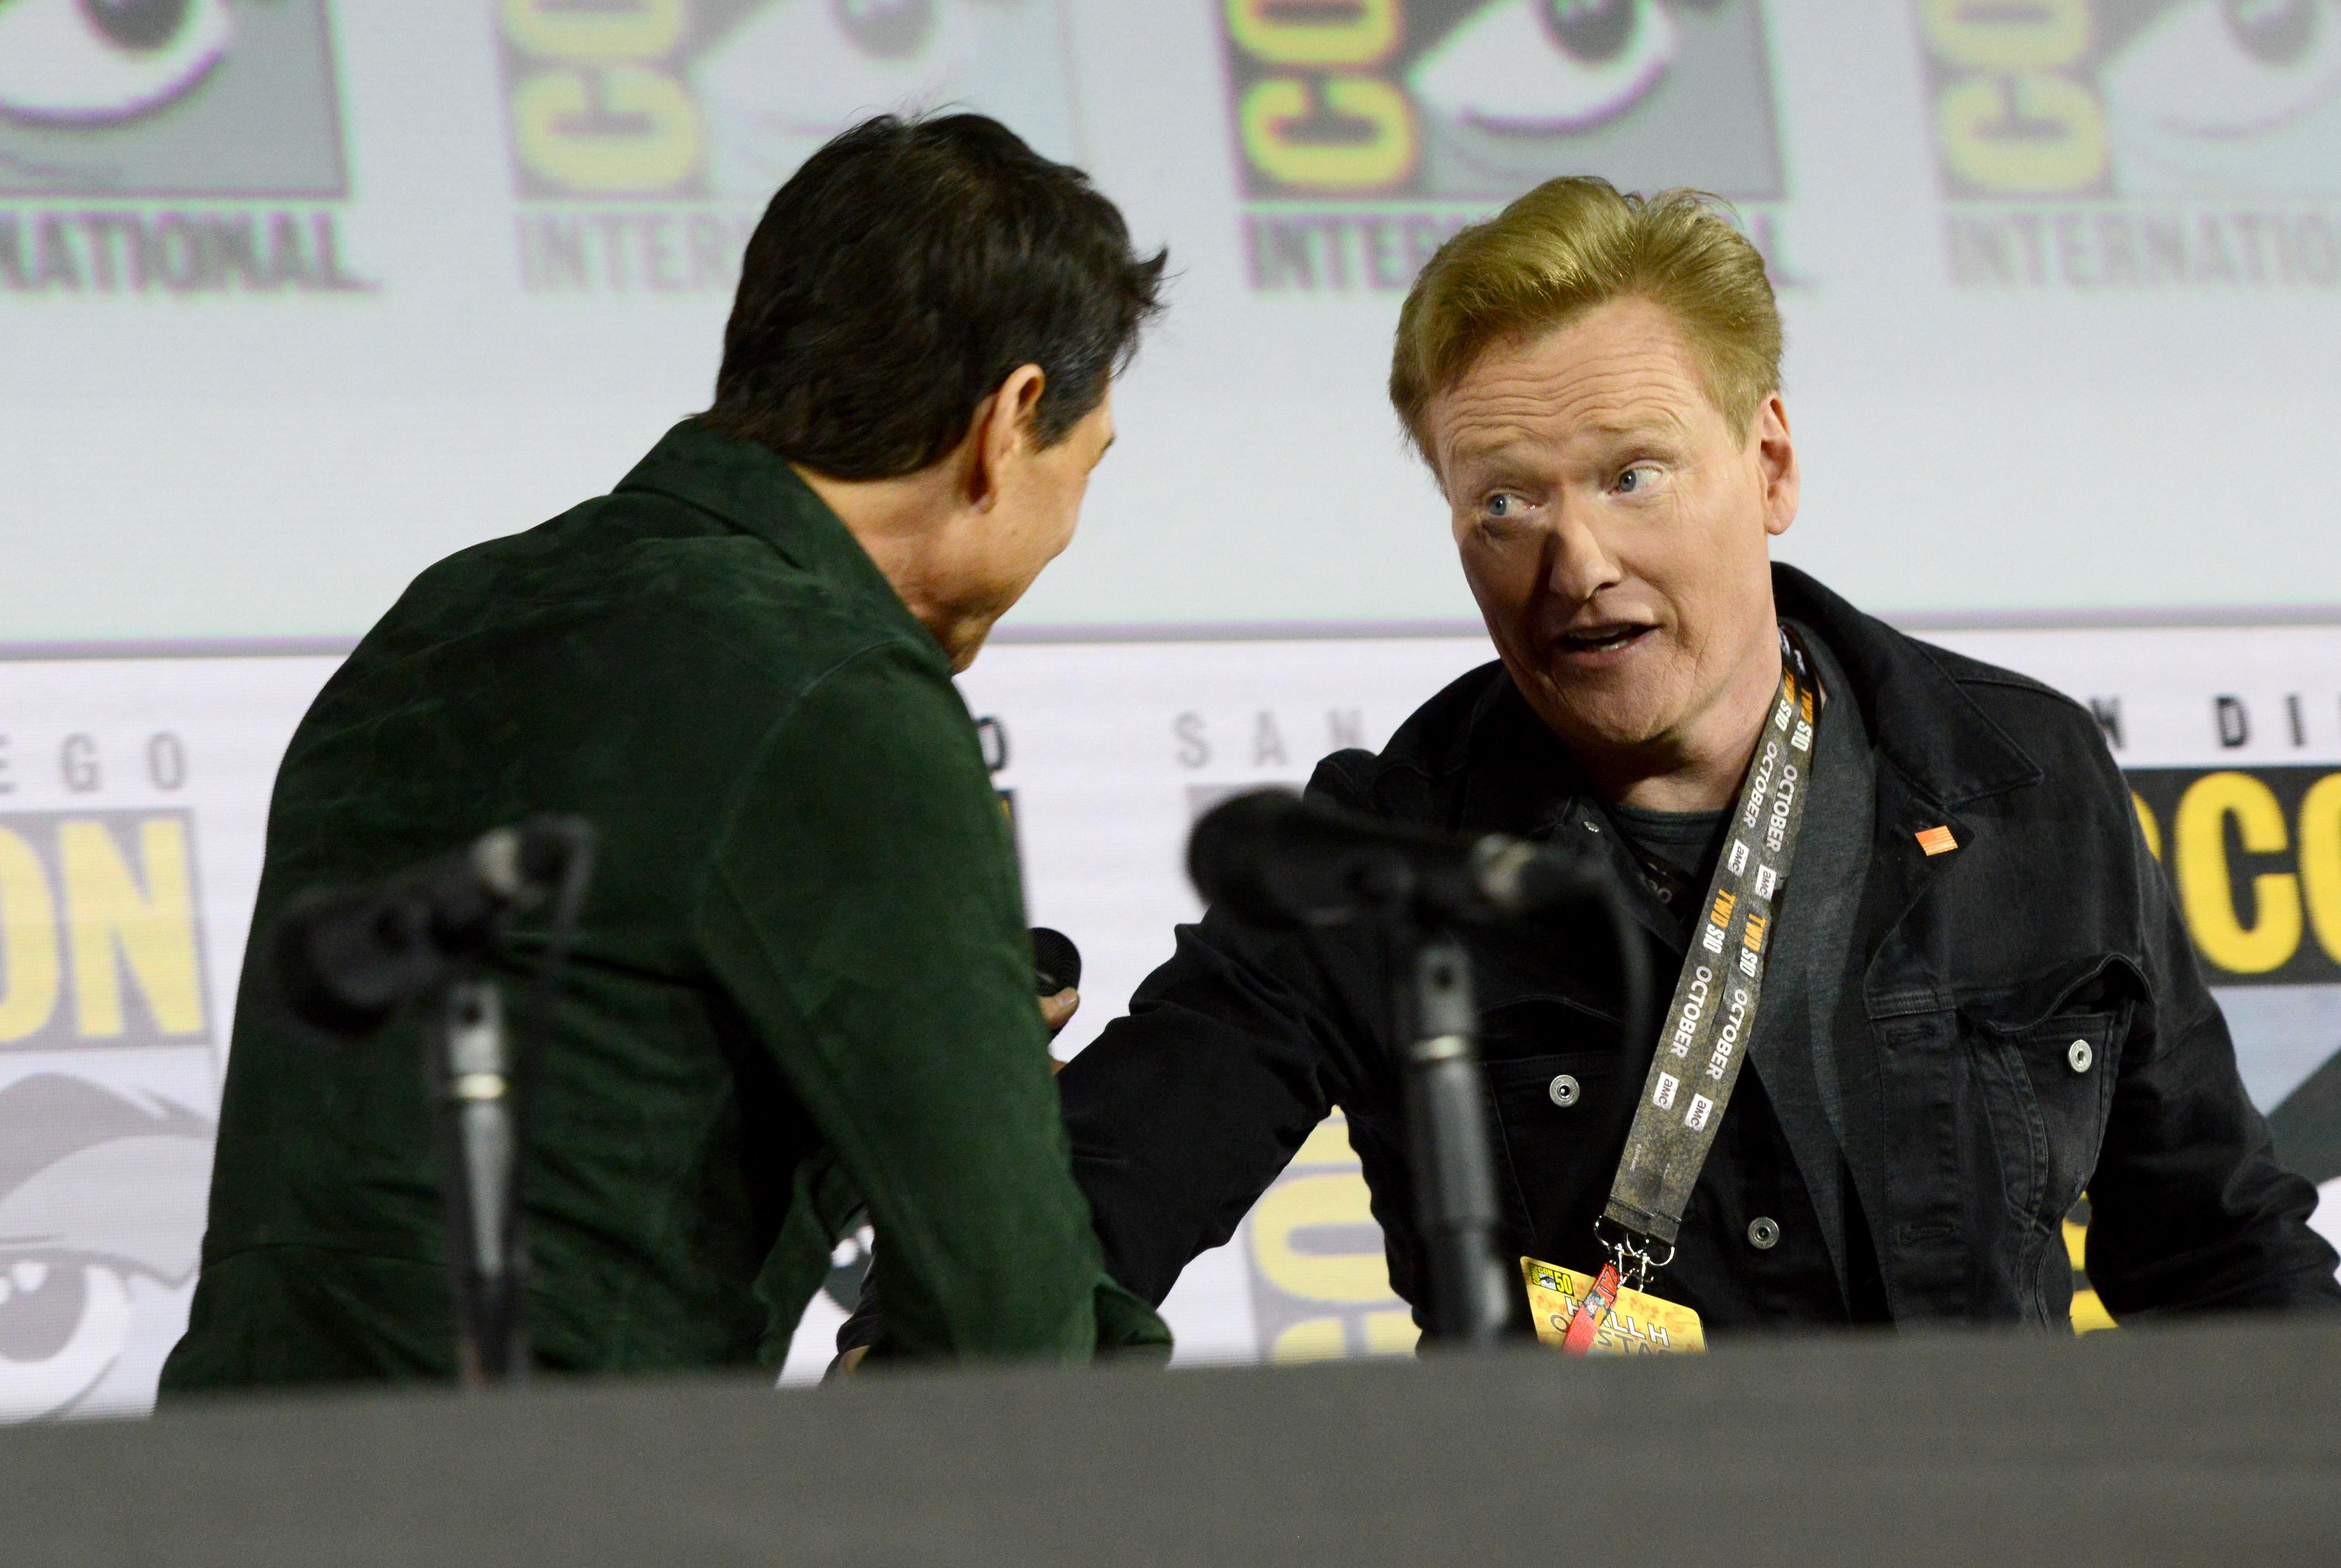 Tom Cruise and Conan O'Brien at an event for Top Gun: Maverick (2021)